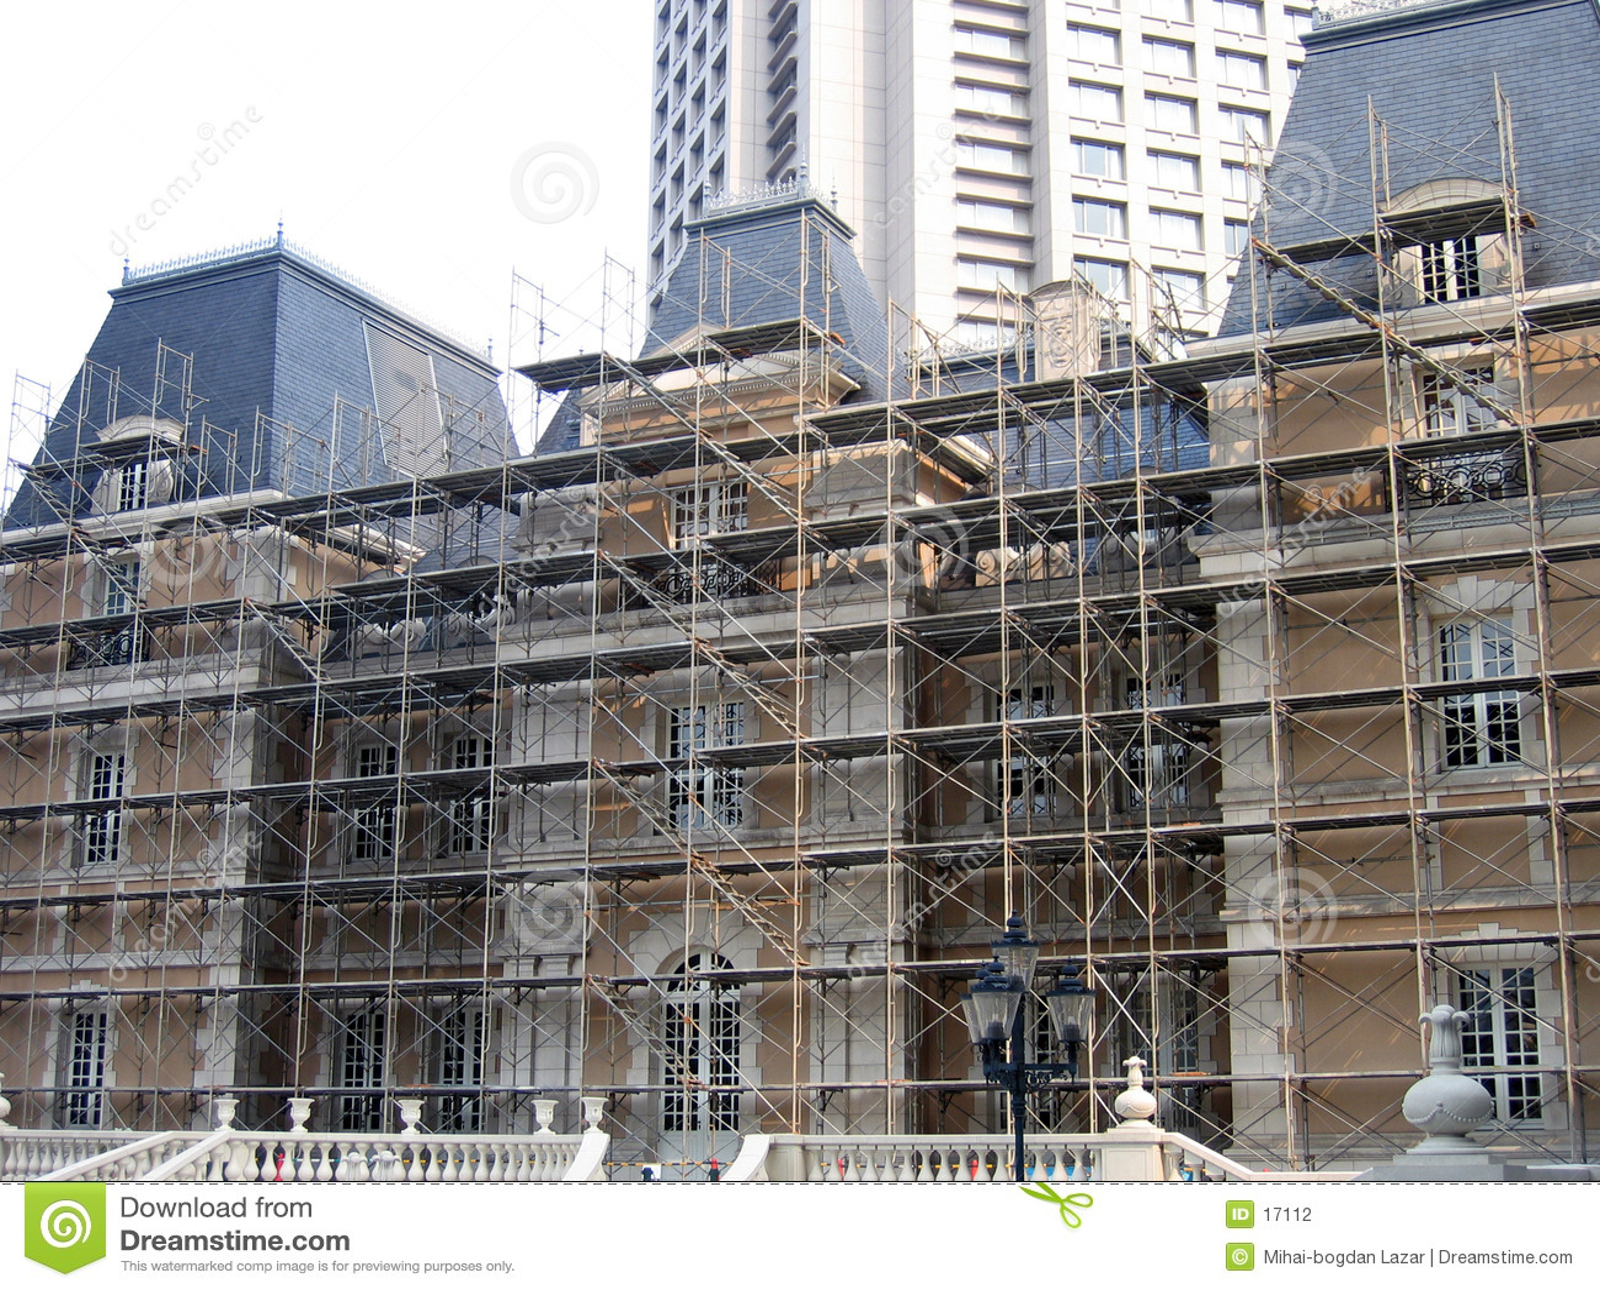 Renovating a historical building